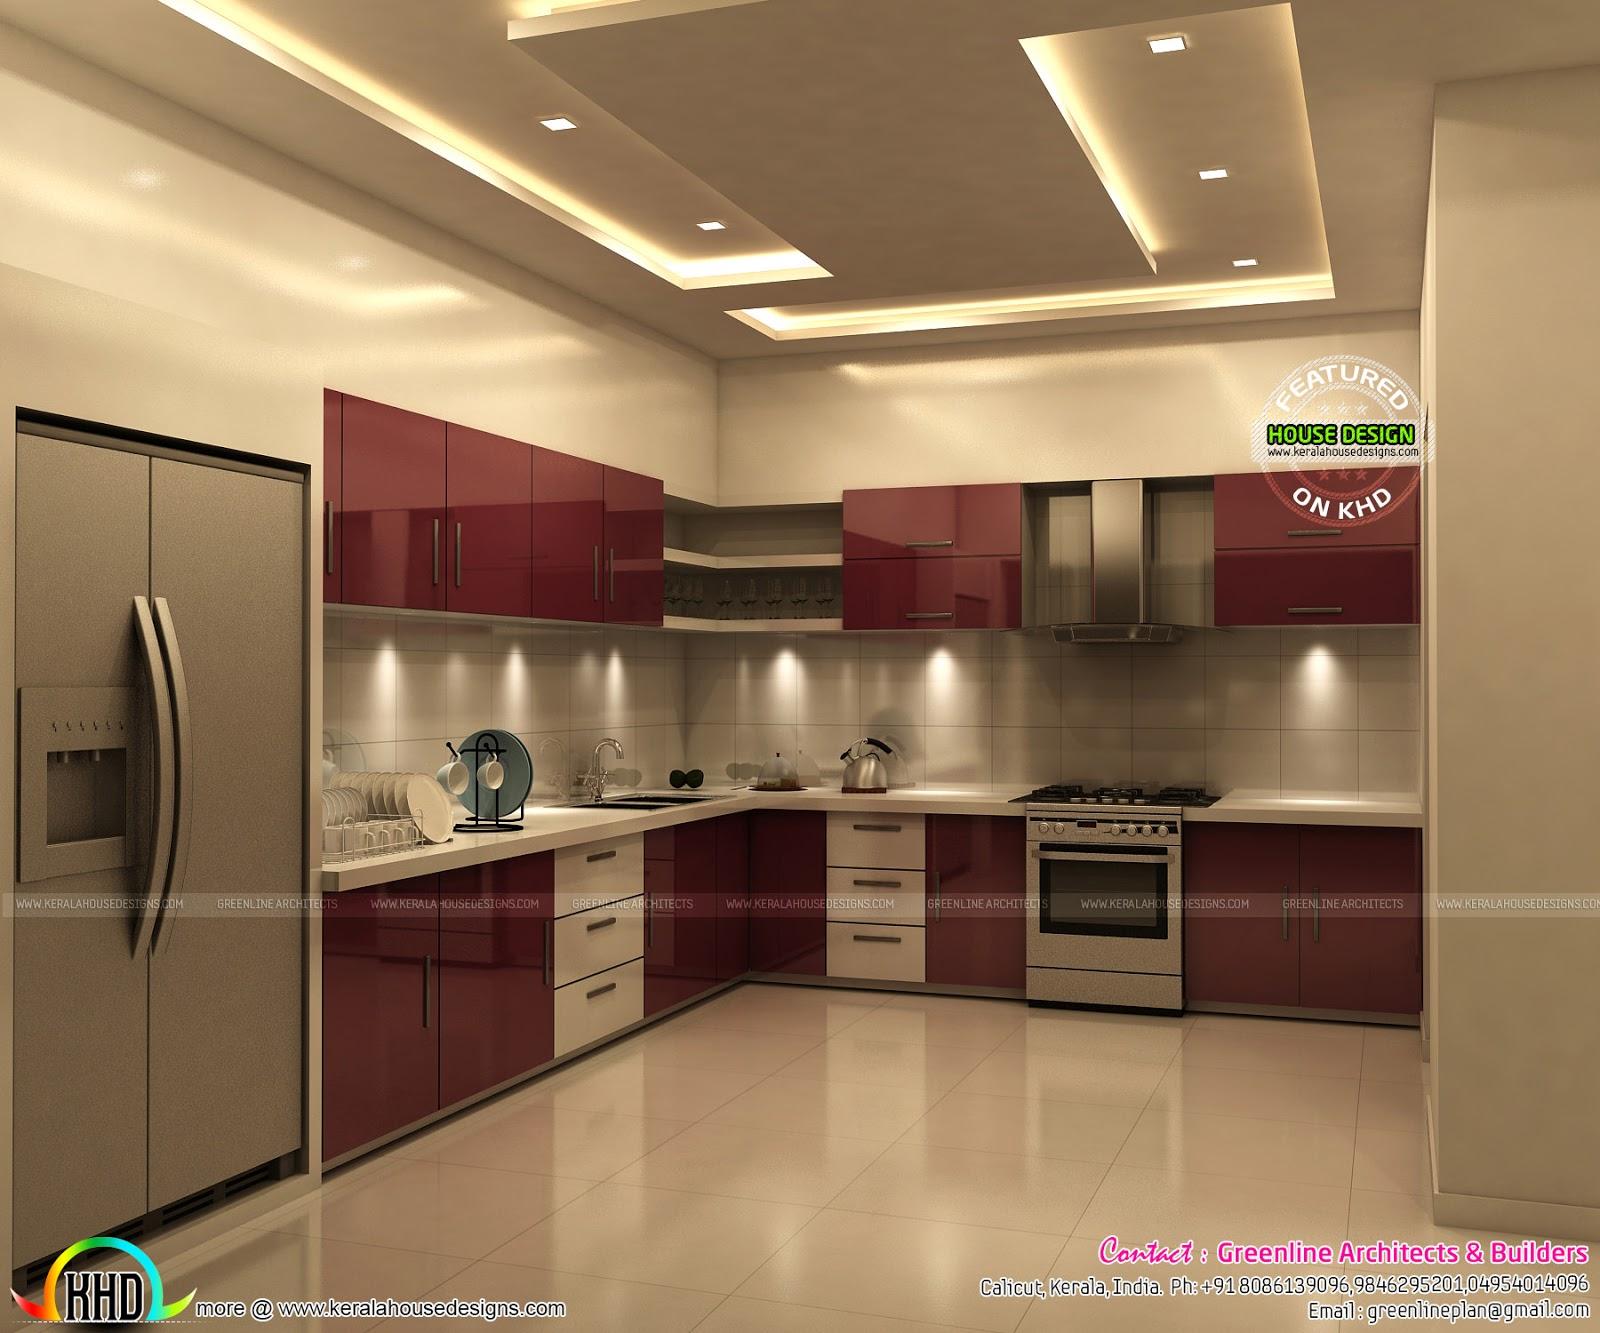 Superb kitchen and bedroom interiors - Kerala home design ...